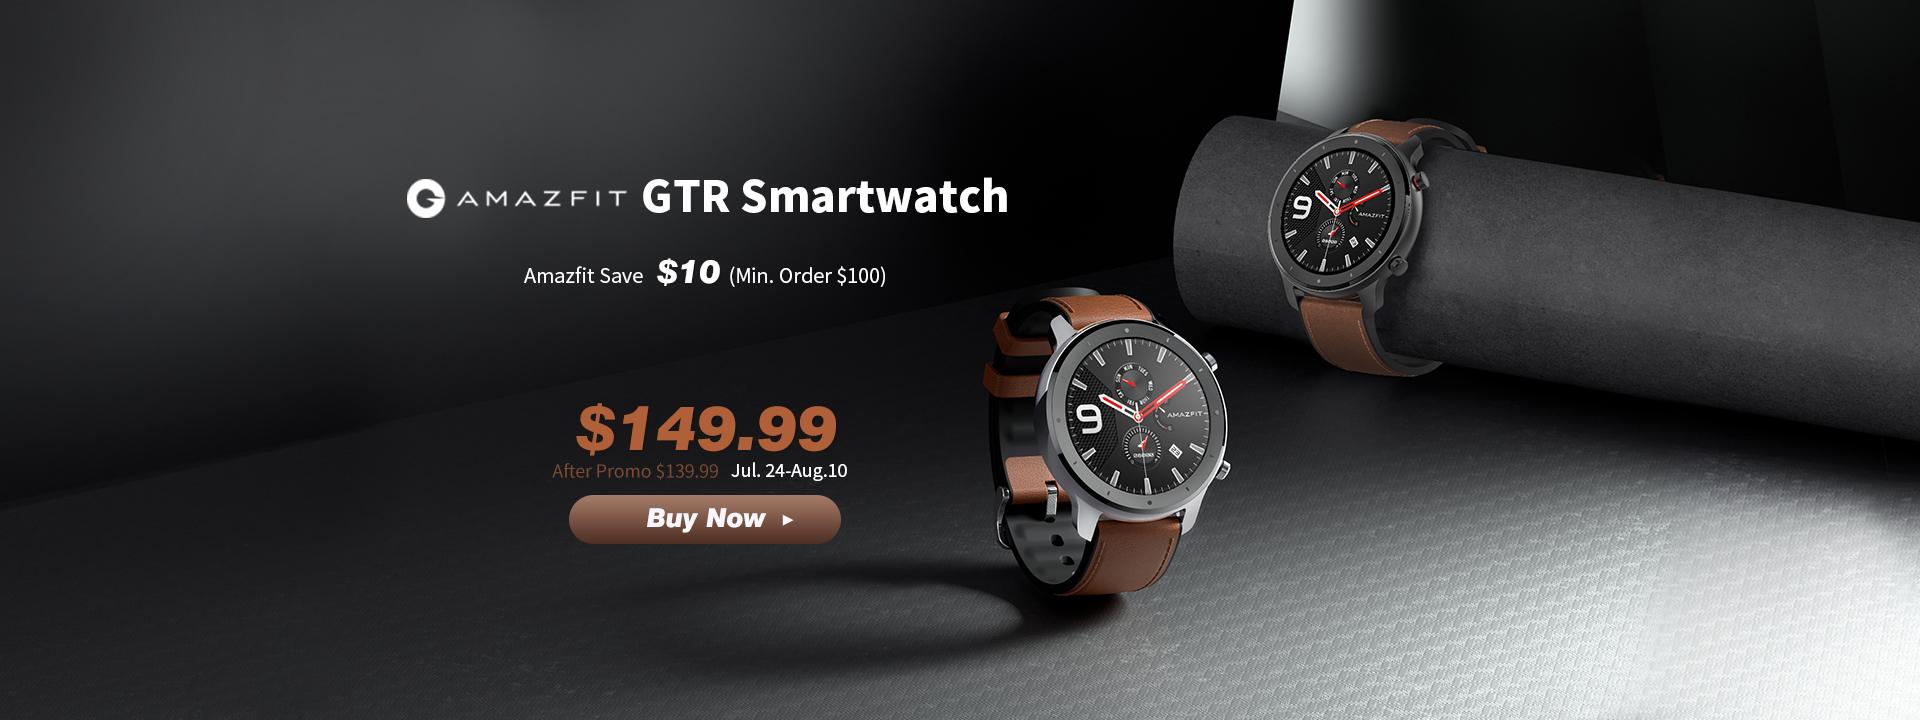 Amazfit GTR smartwatch for Just $139.99 2